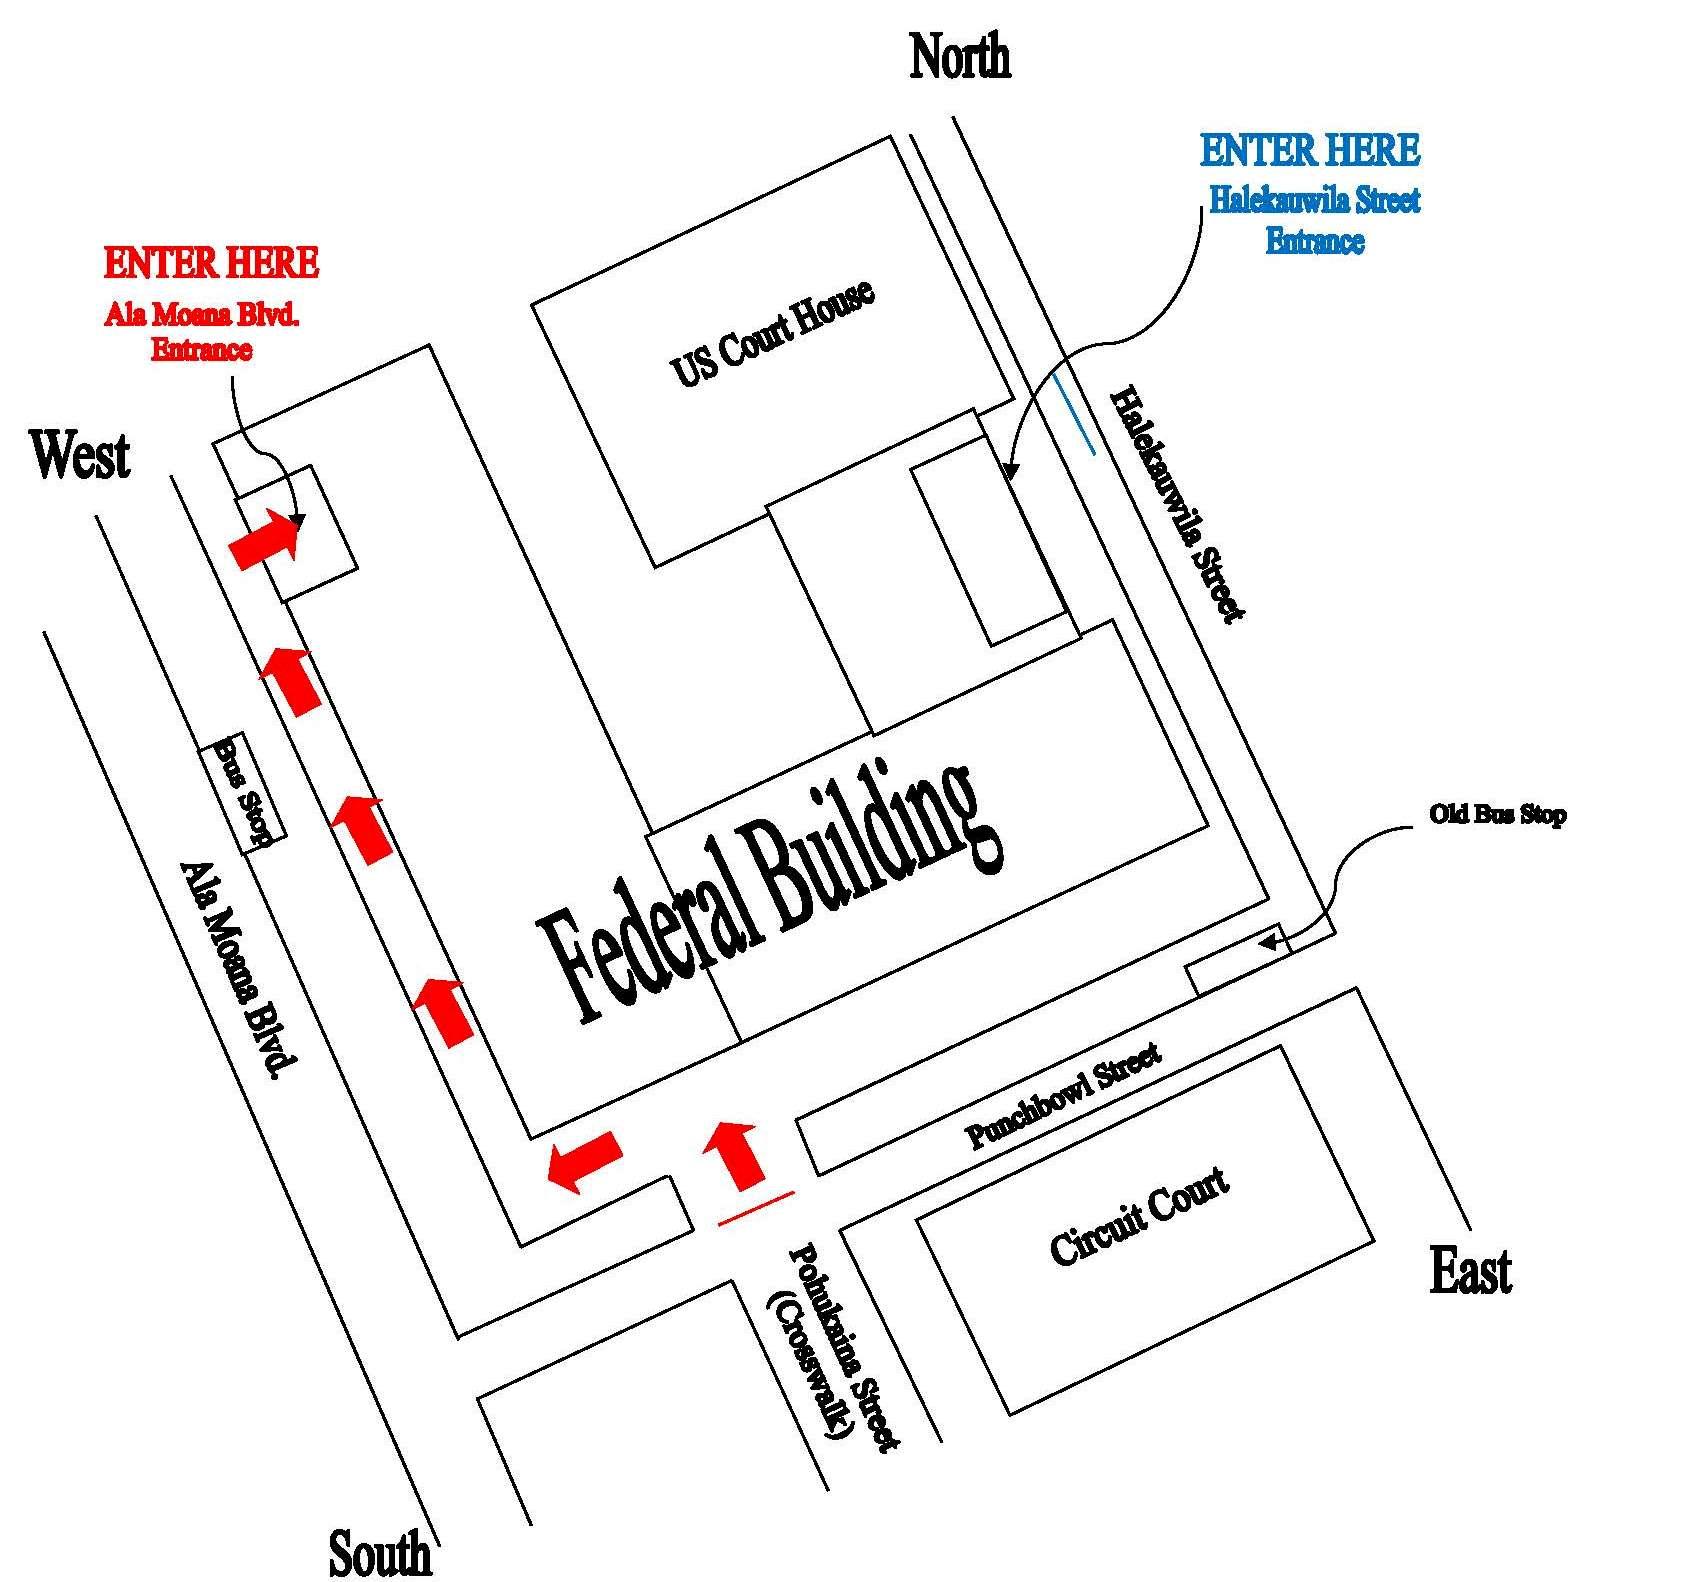 Transportation And Parking Information